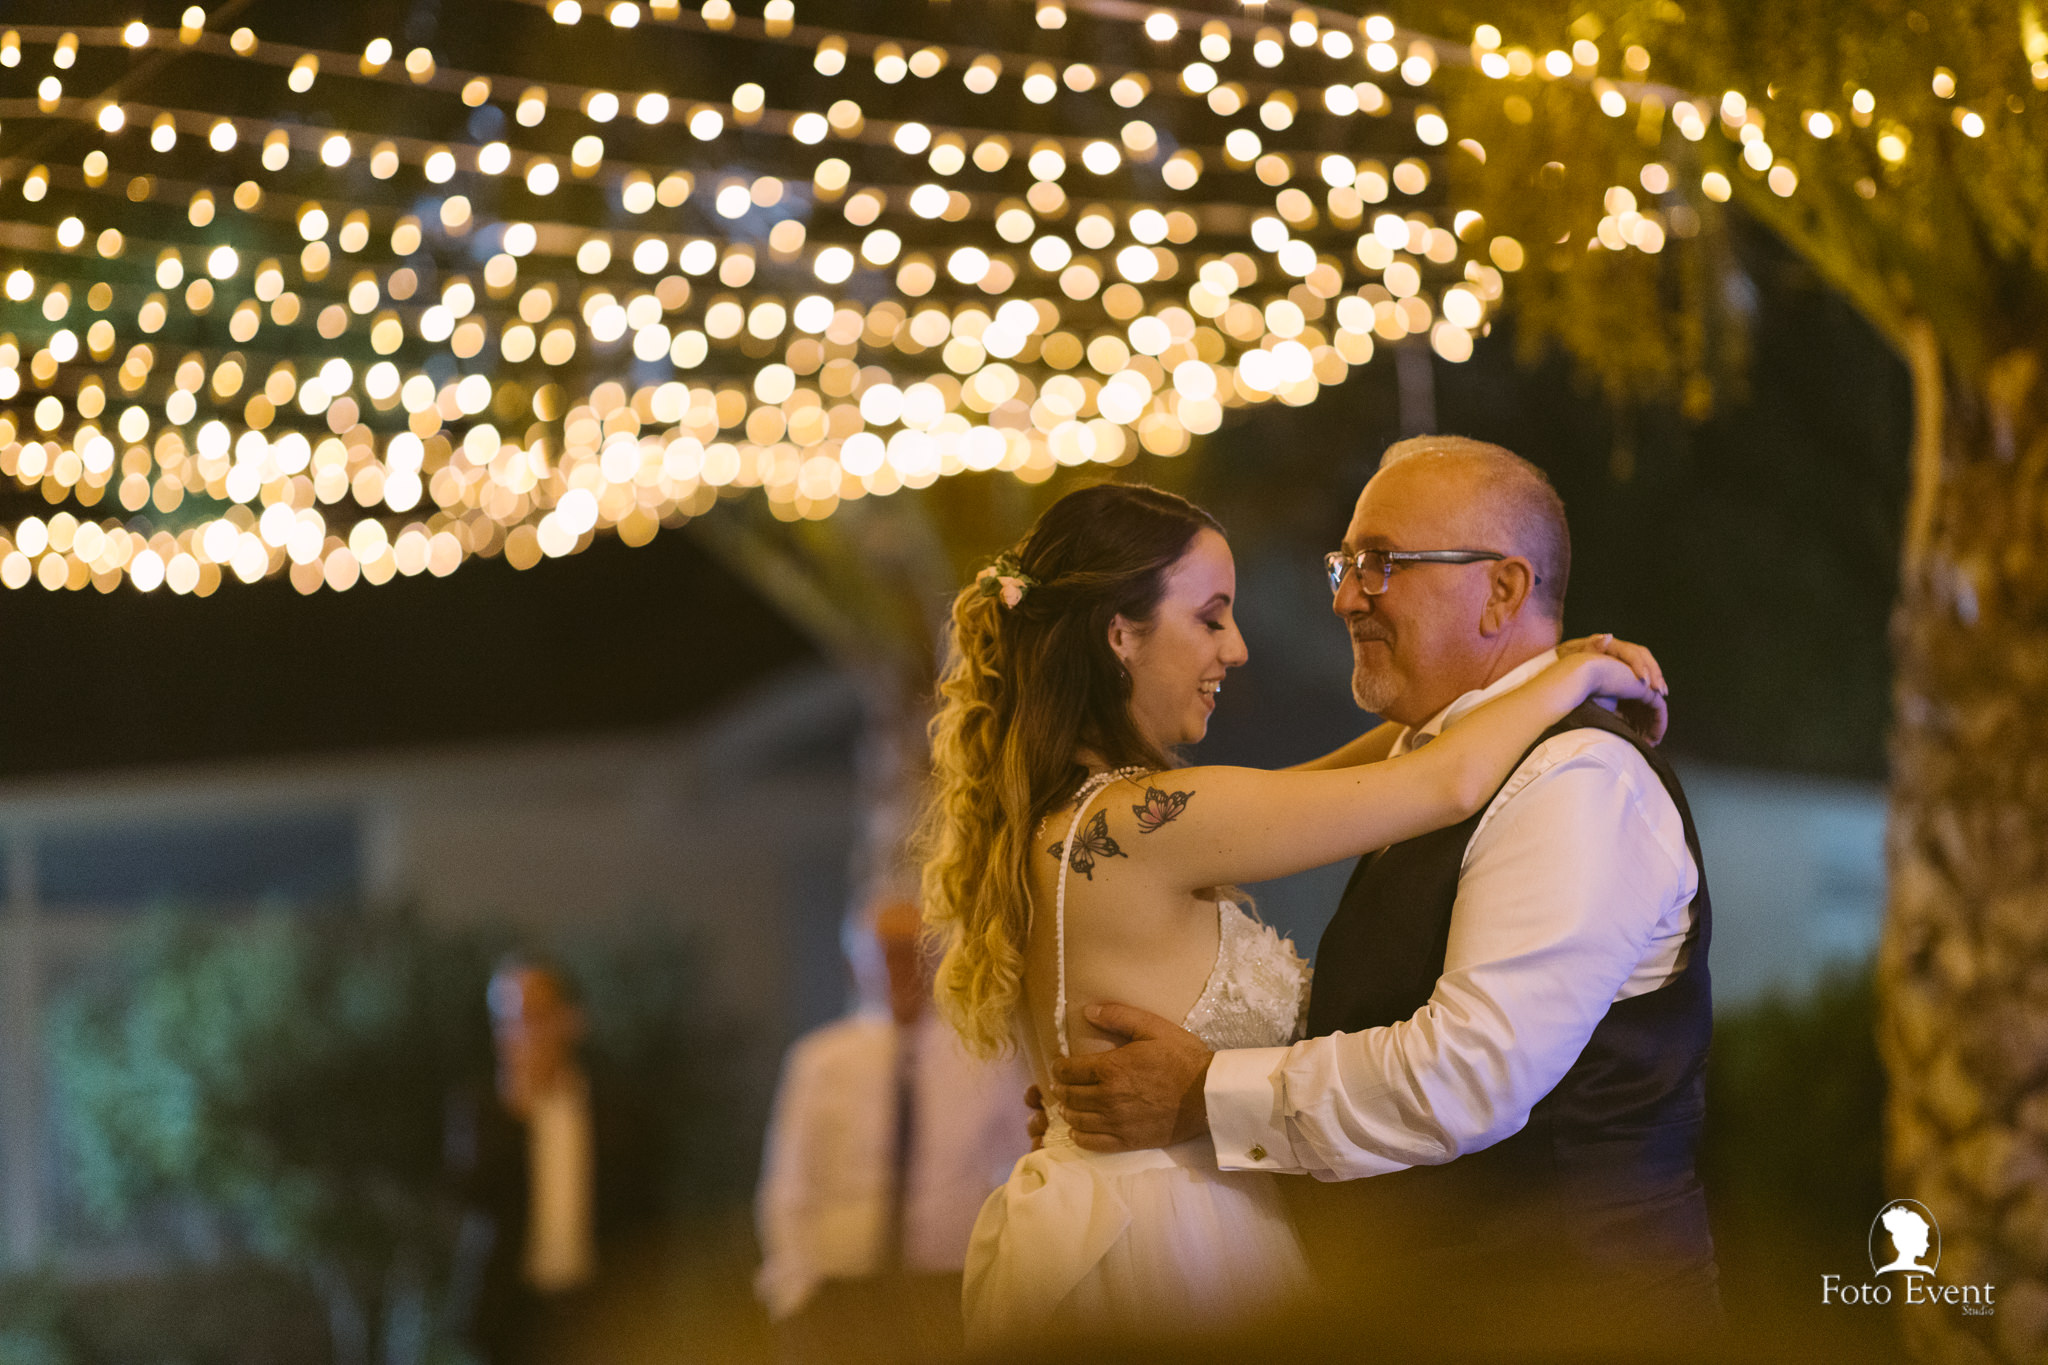 061-2019-08-22-Matrimonio-Angela-e-Nicola-Iaconis-Ric2-779